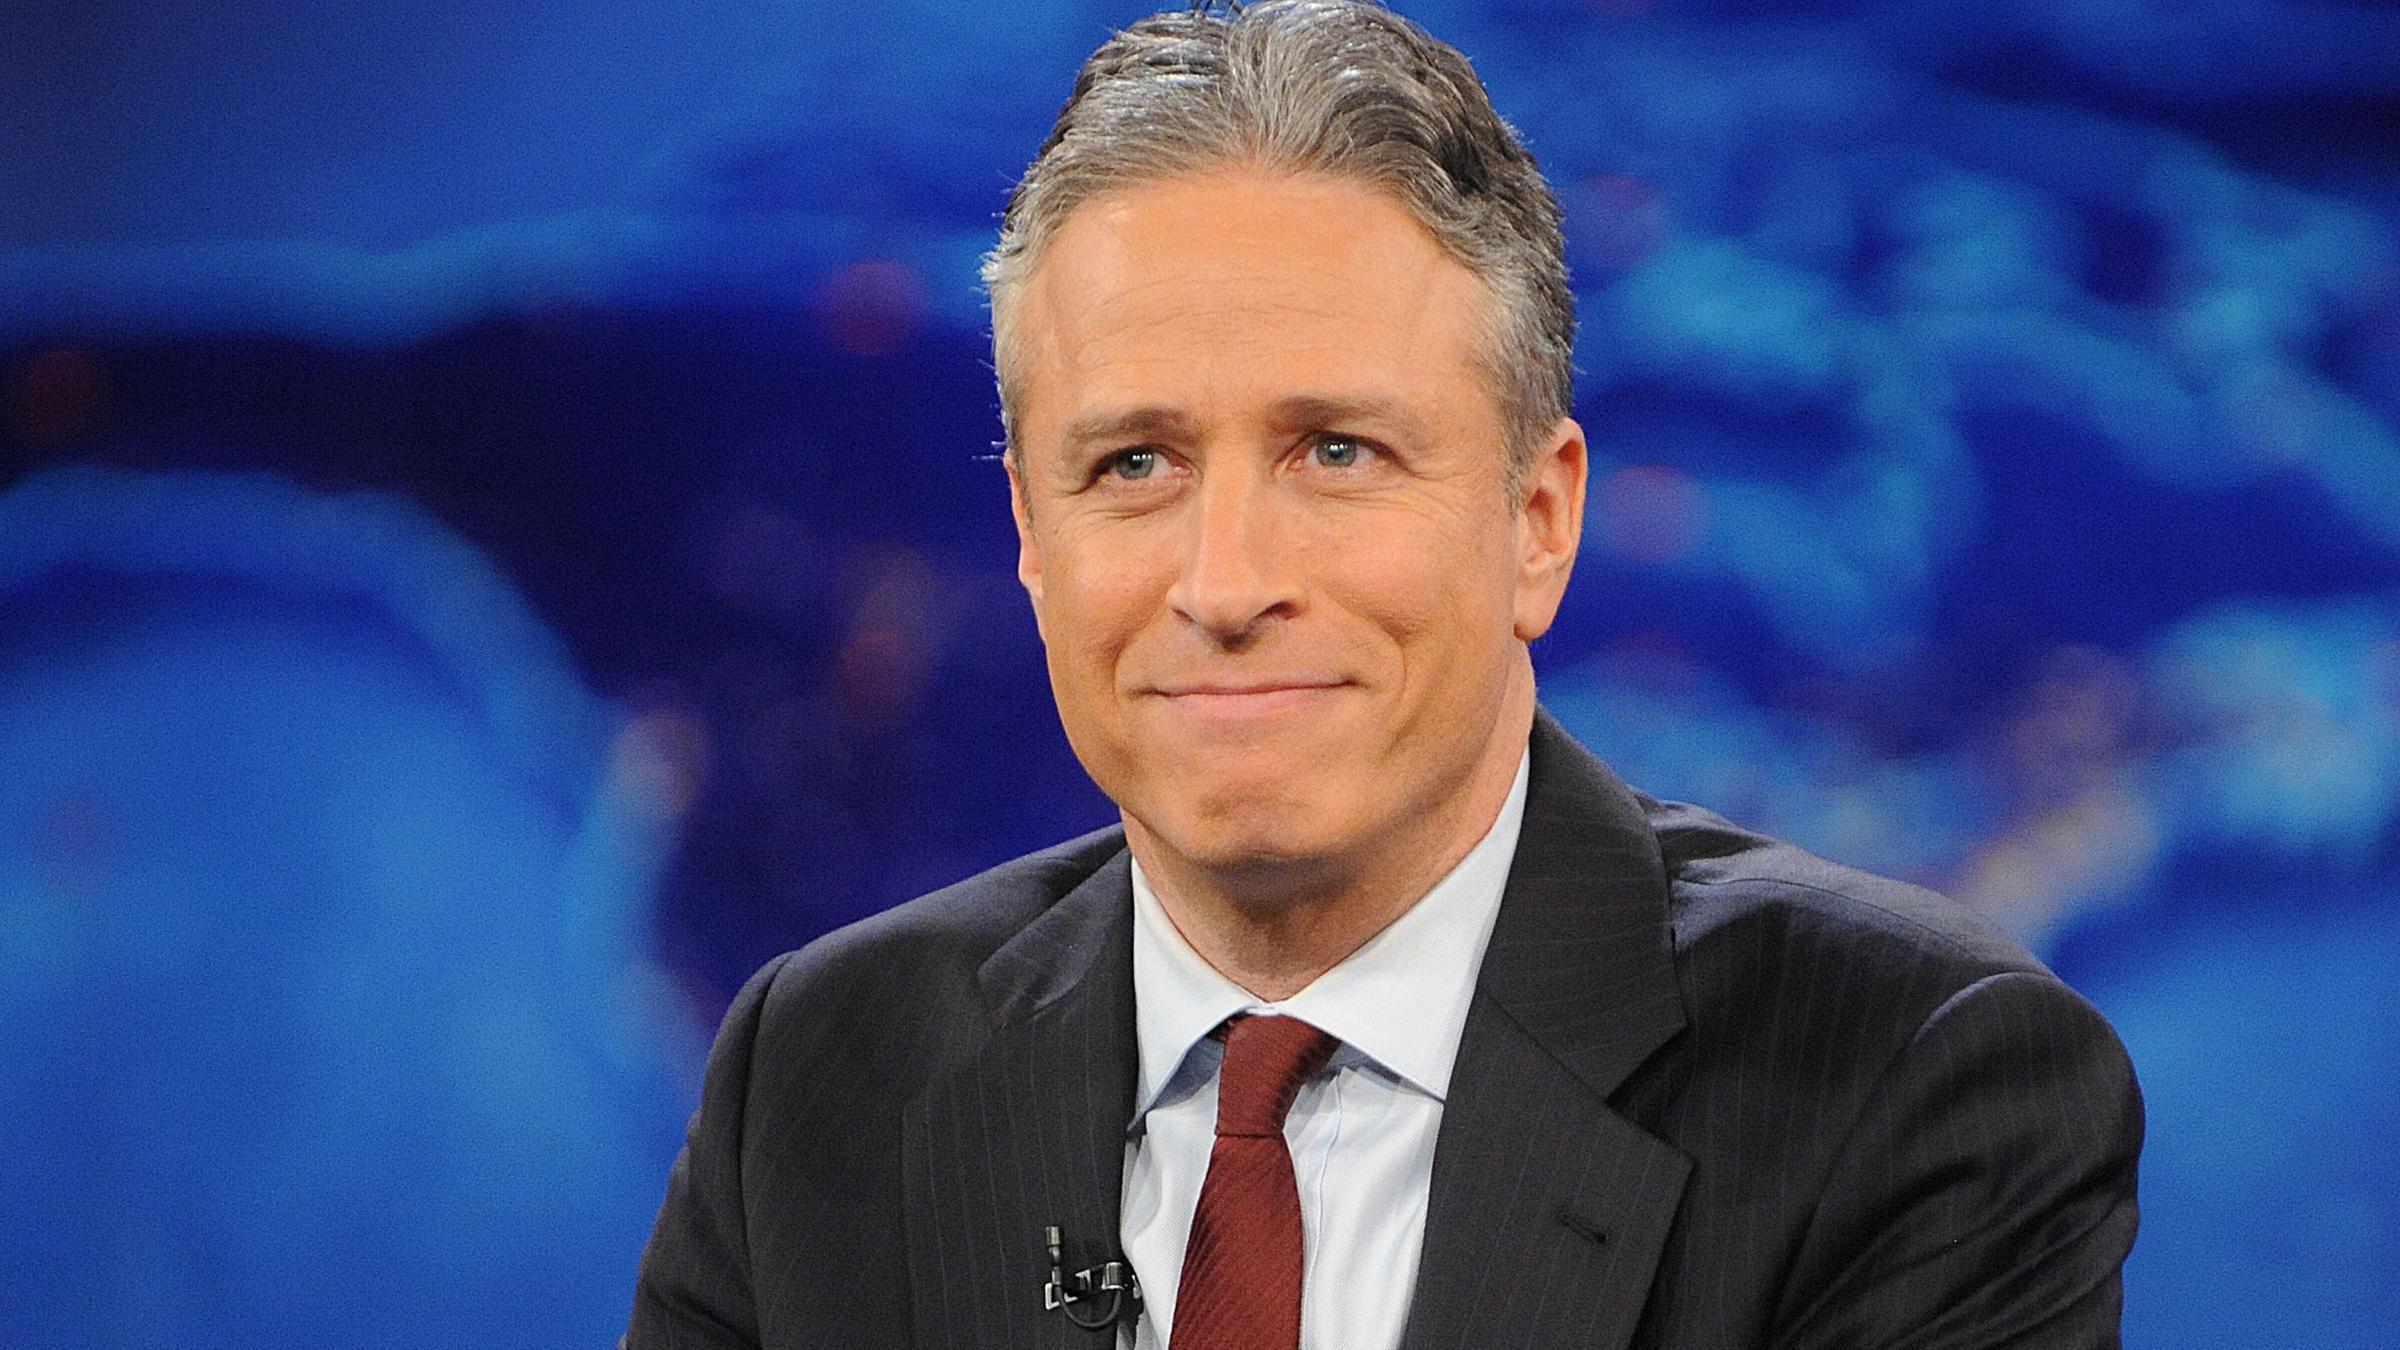 Jon Stewart On His 'Daily Show' Run: 'It So Far Exceeded ...